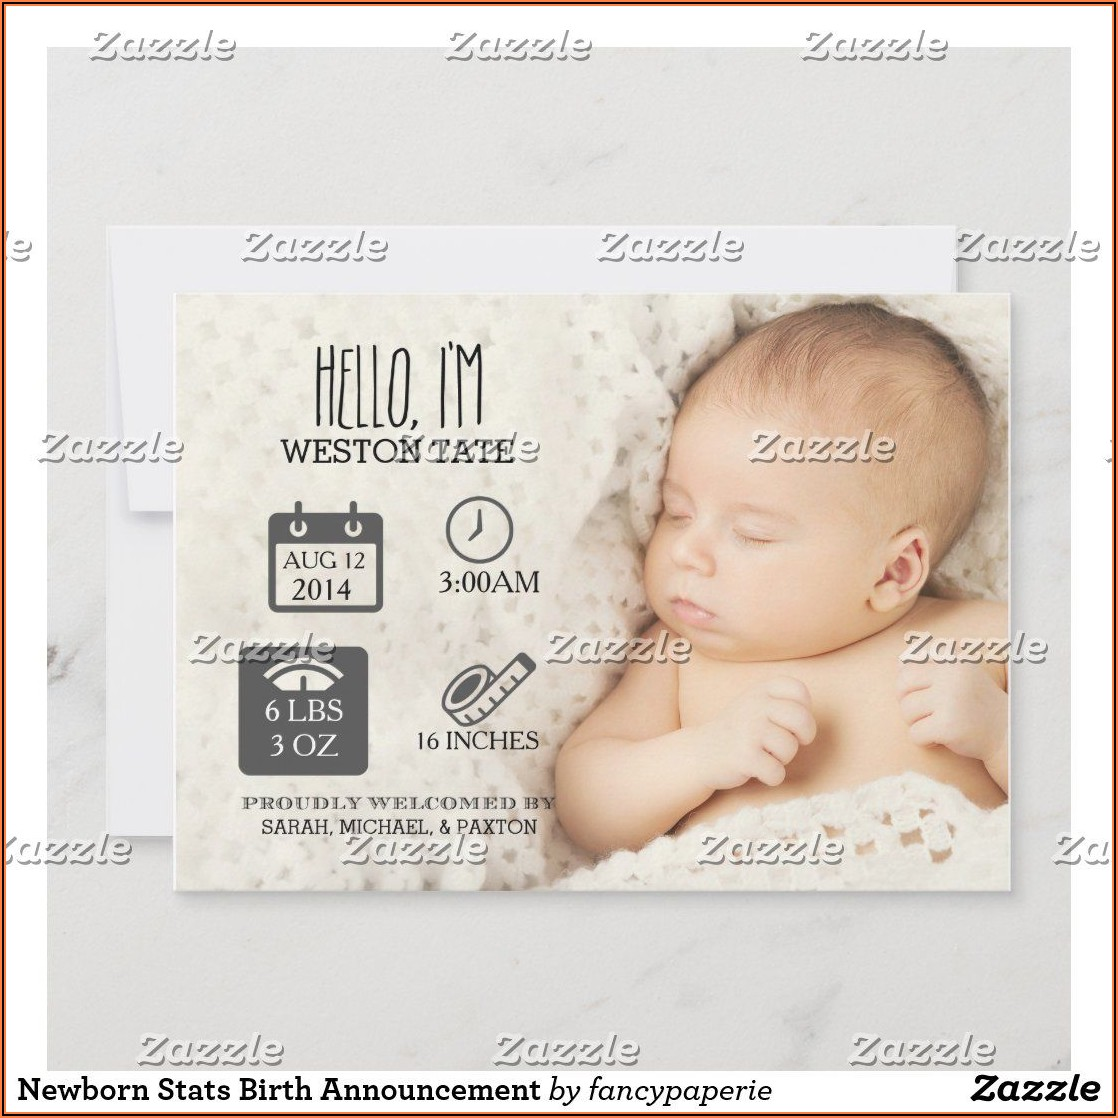 Grandchild Birth Announcement Wording